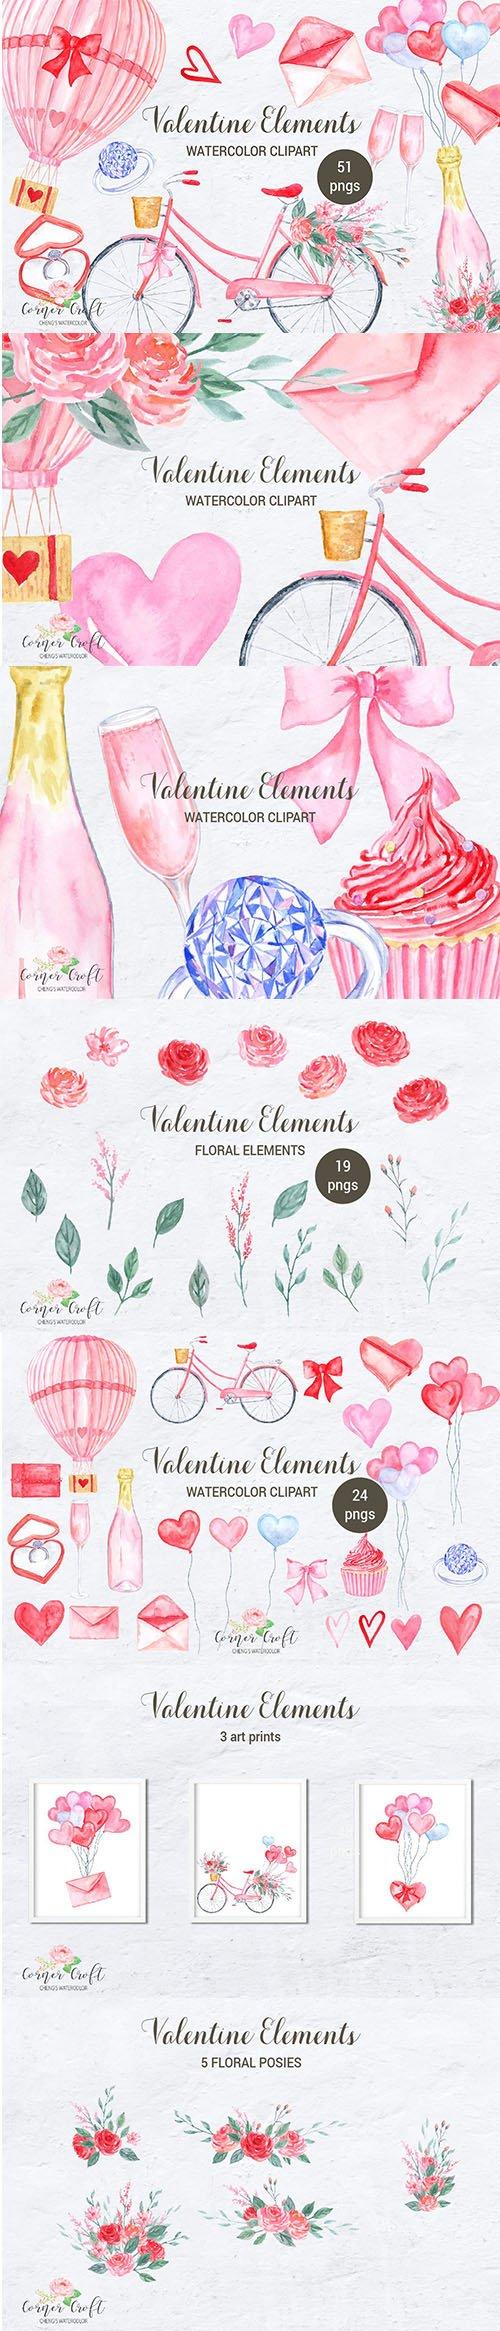 Watercolor Valentine Elements